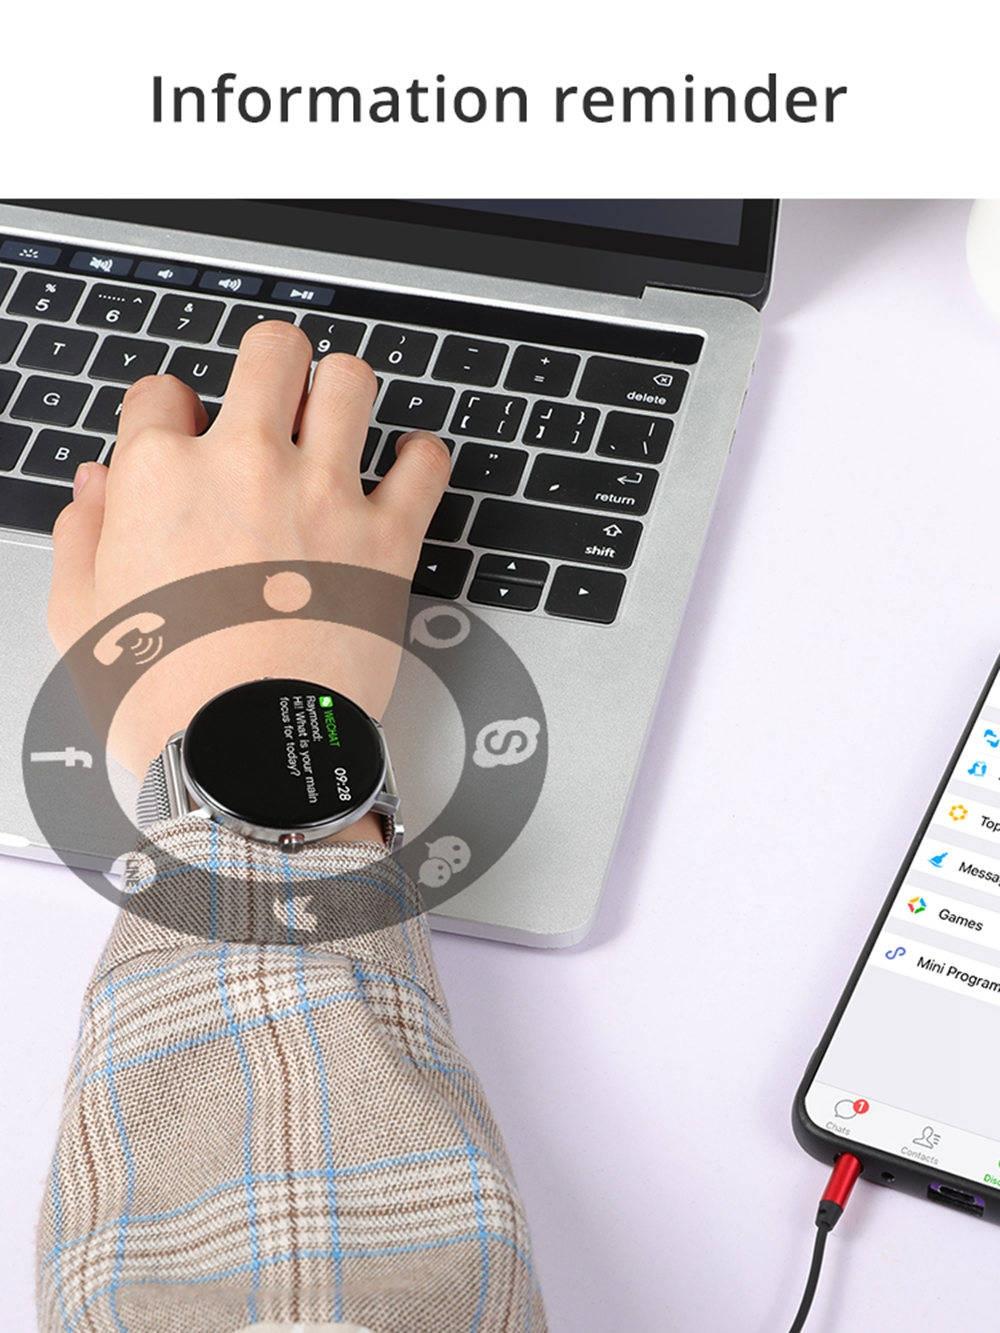 K9 Smart Watch 1.3 Inch IPS Screen Heart Rate Blood Pressure Monitor IP68 Fitness Tracker Smartband - Black